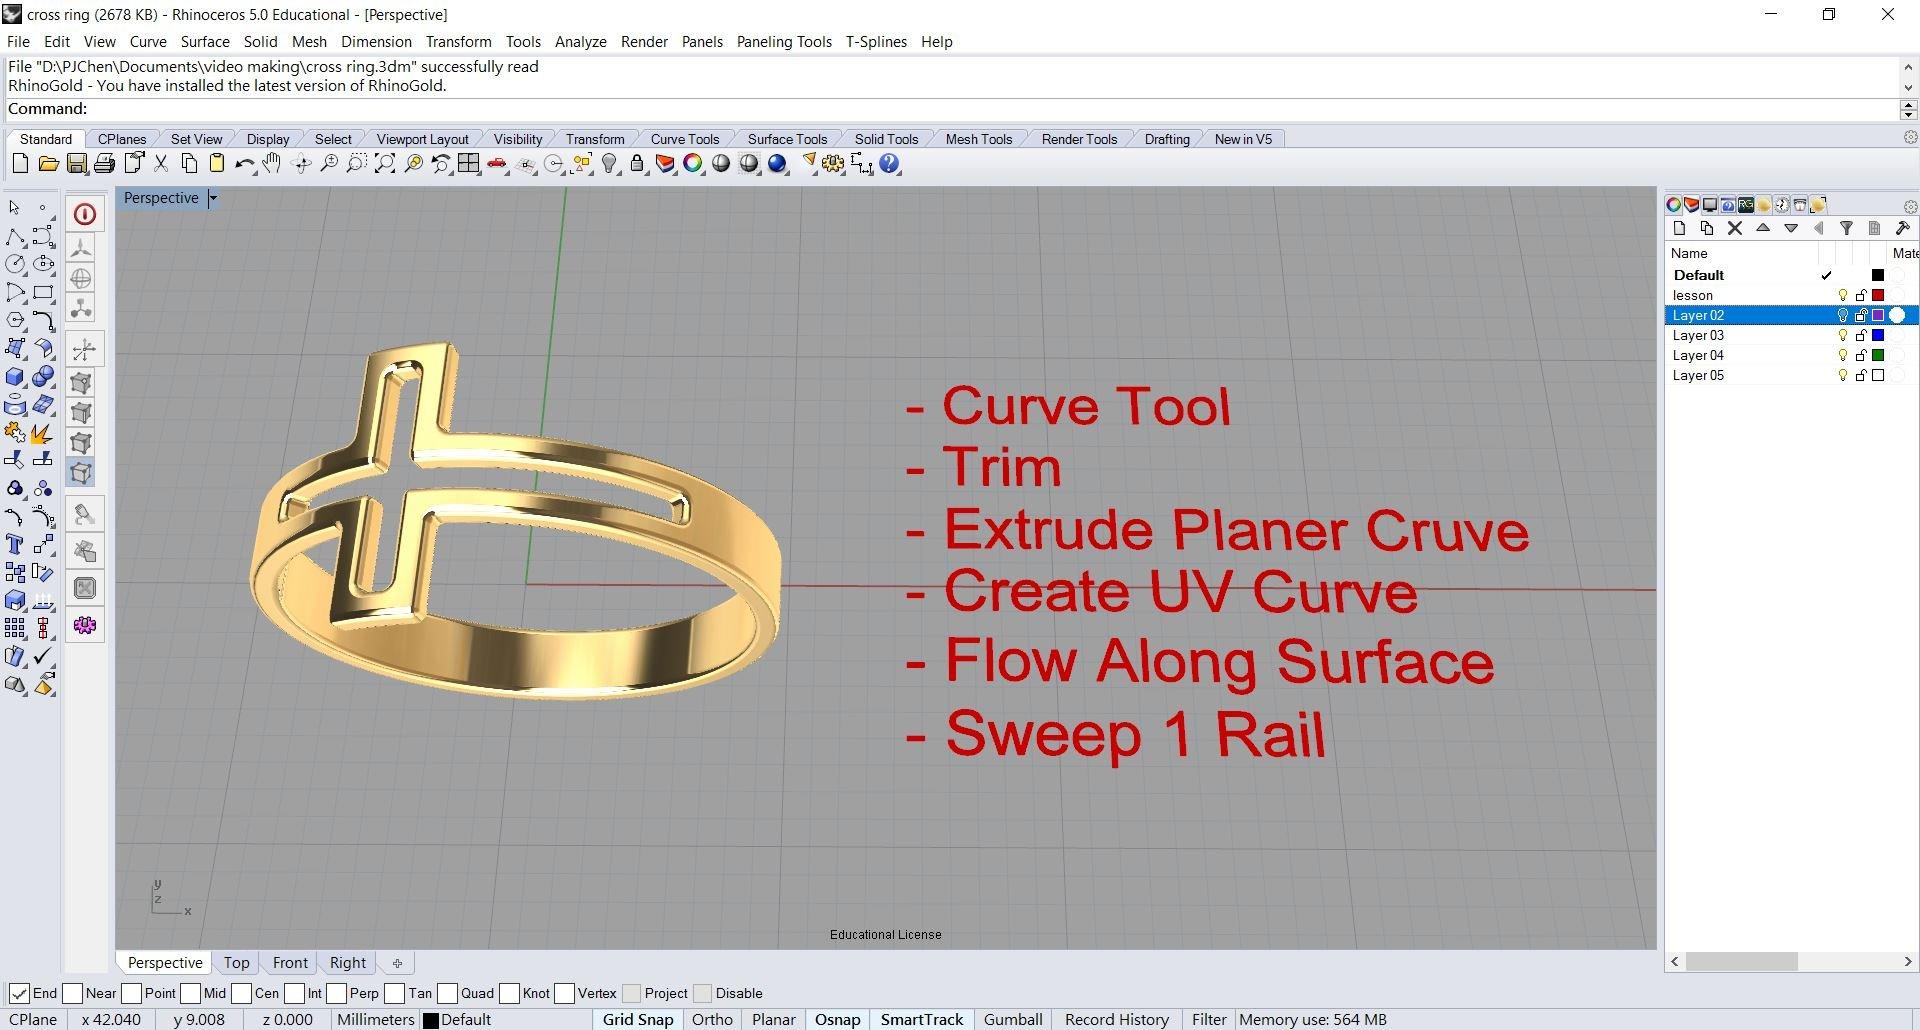 Making a Cross Ring in Rhino 3D | PJ Chen | Skillshare